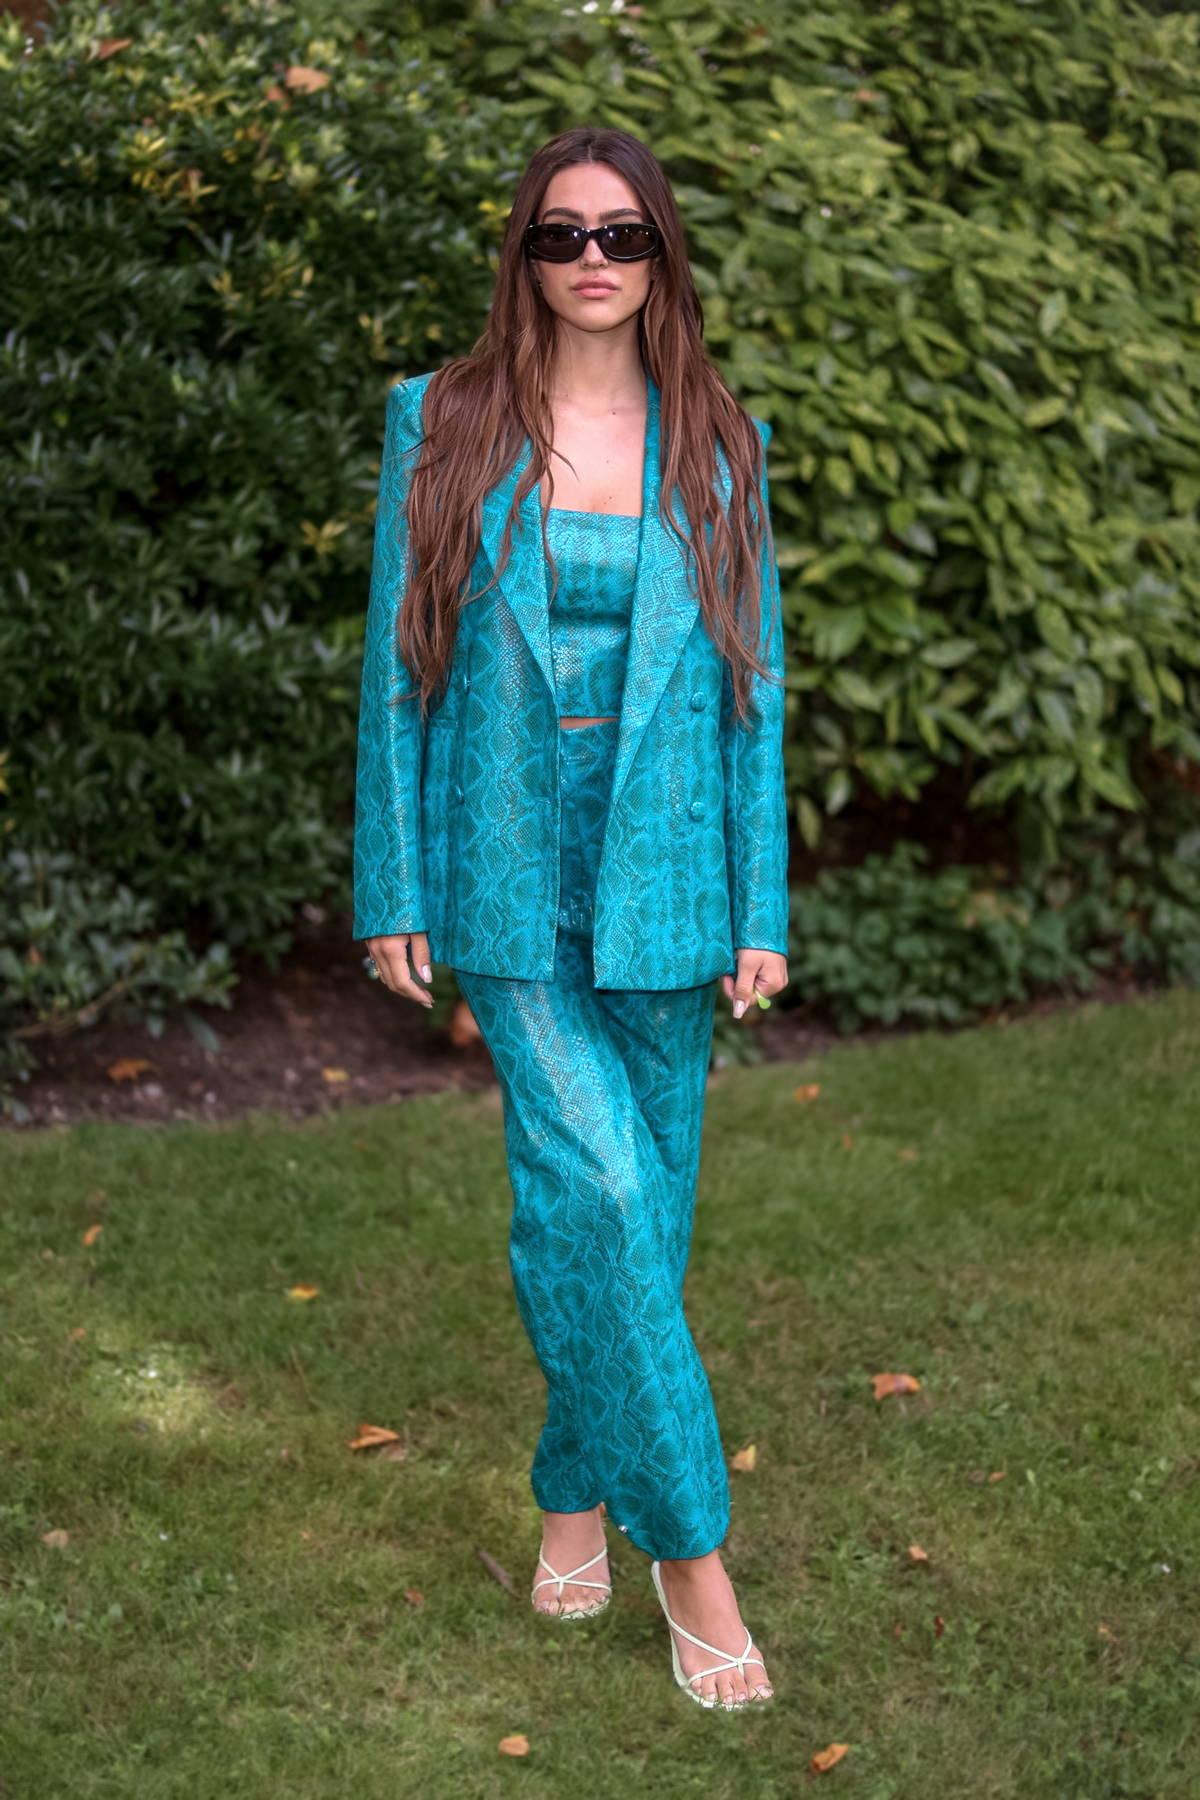 Amelia Hamlin attends the Bora Aksu show during London Fashion Week in London, UK